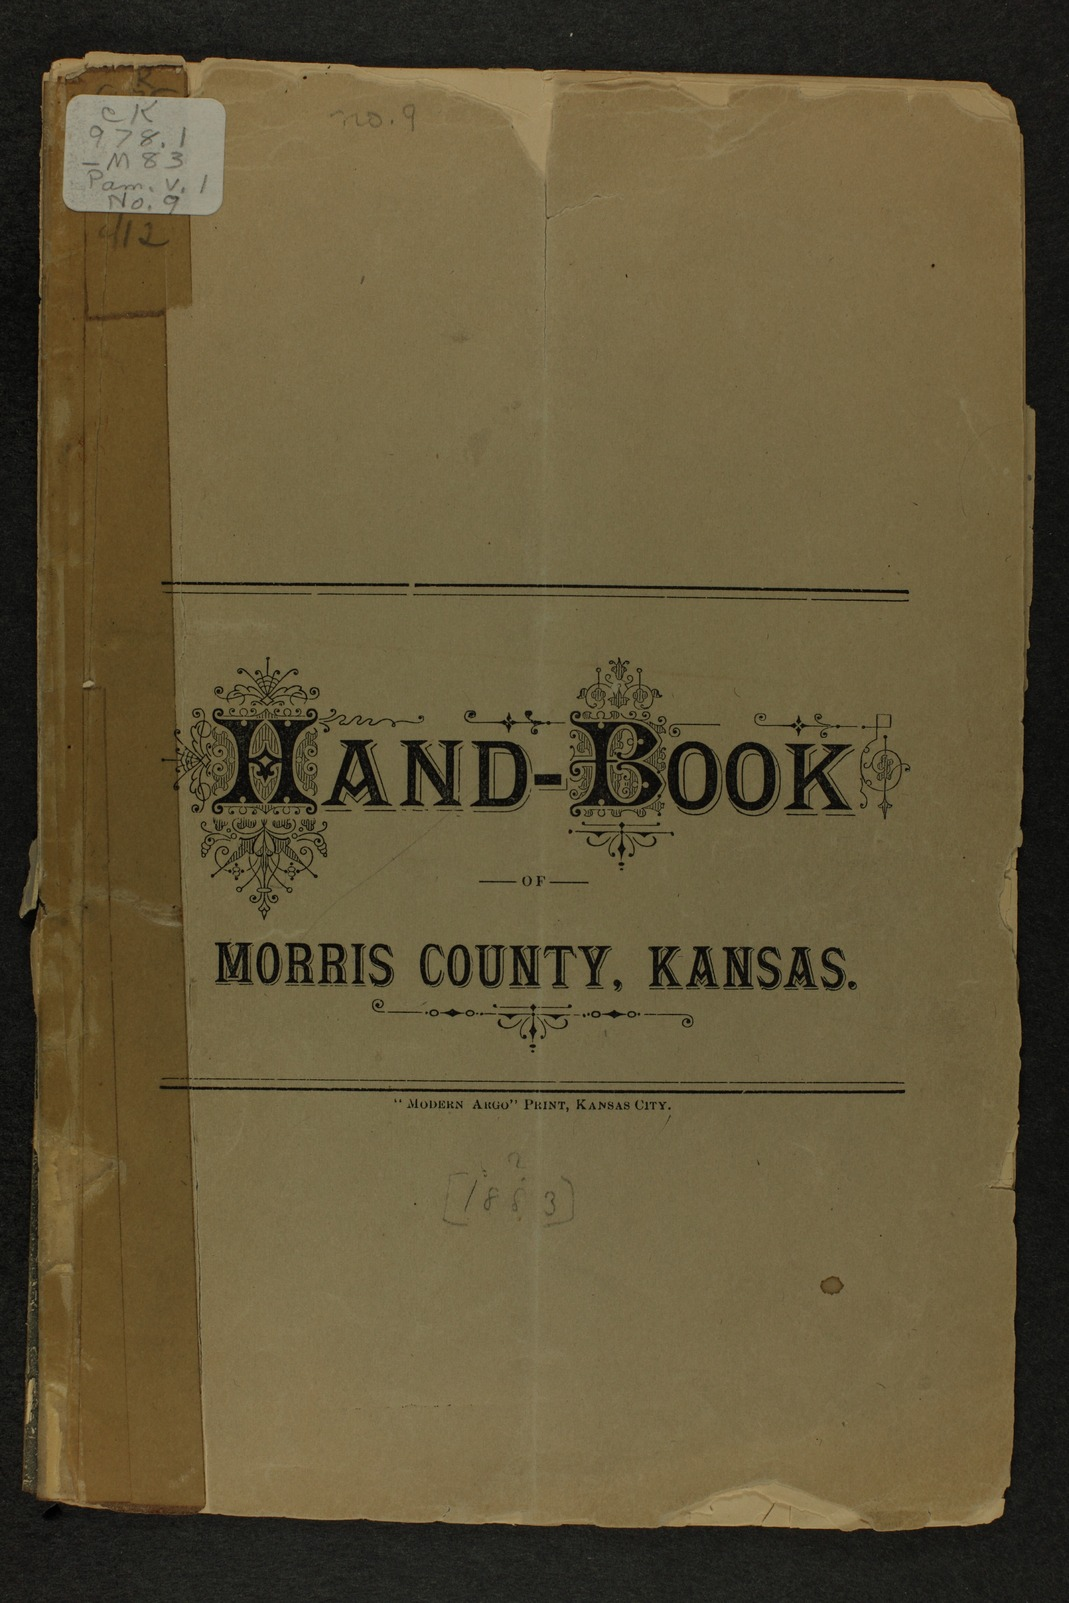 Handbook of Morris County, Kansas - Title page